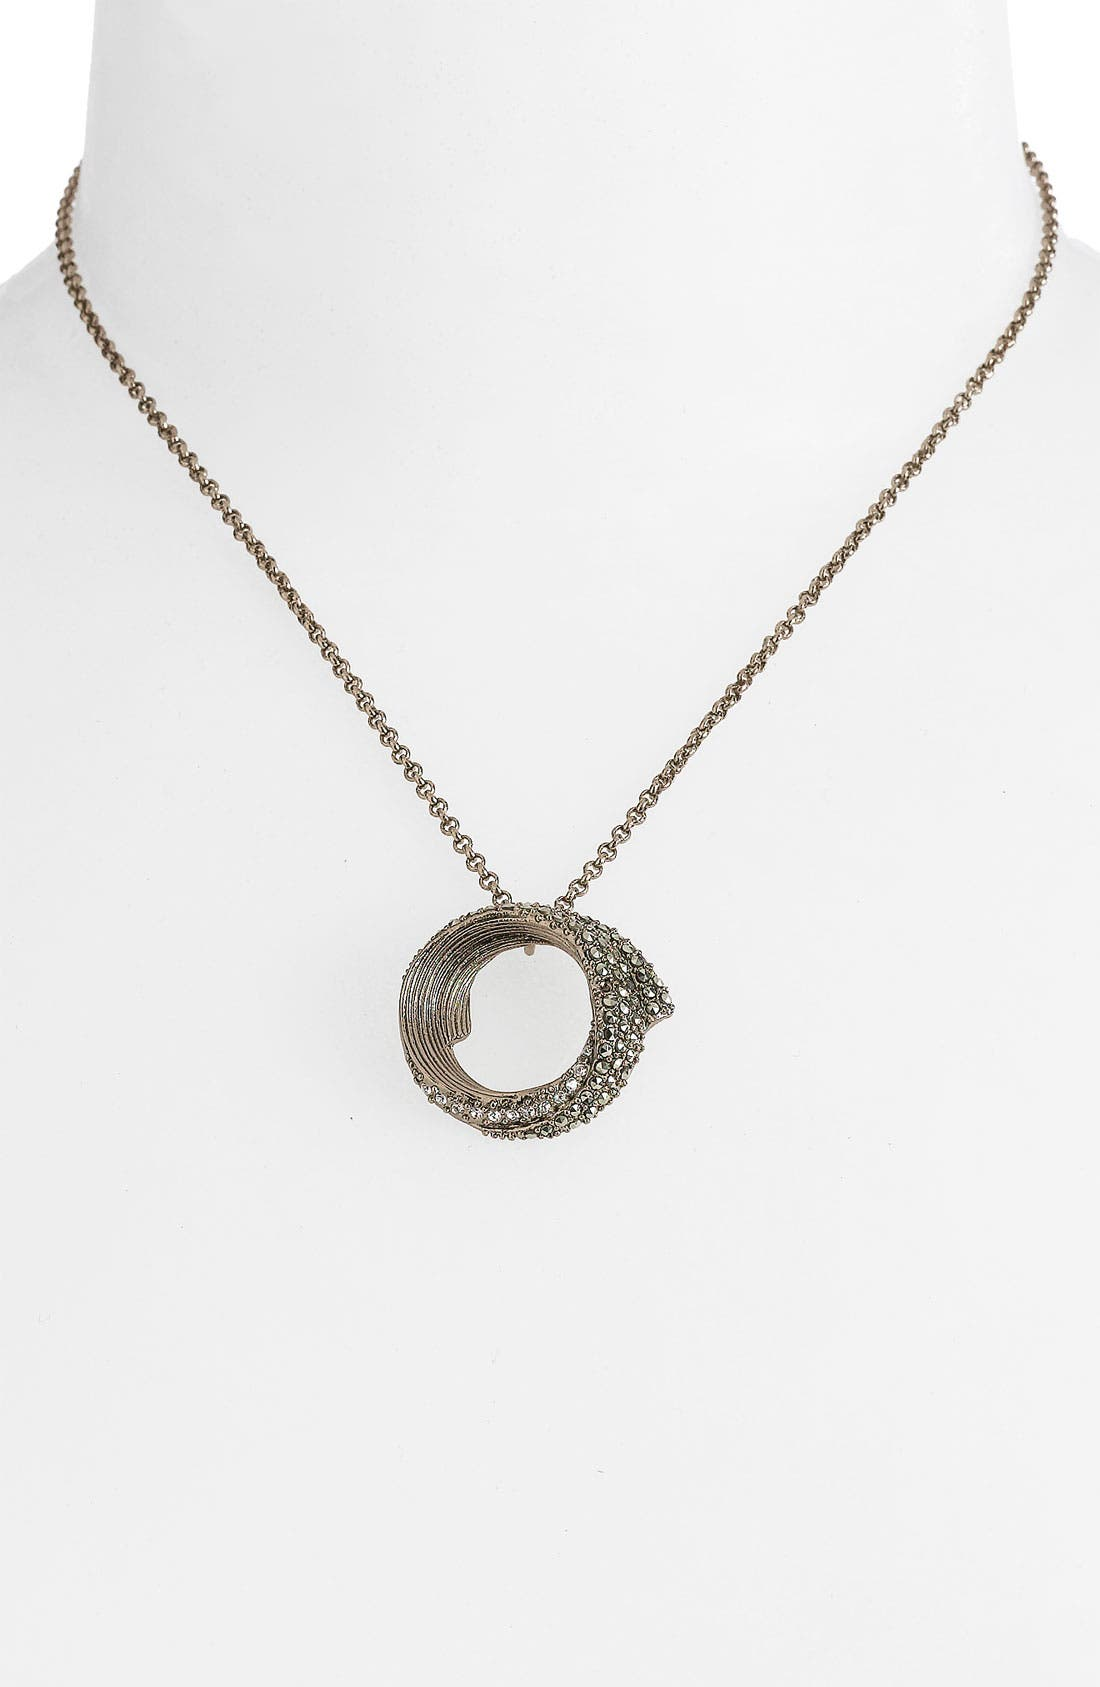 Alternate Image 1 Selected - Judith Jack 'Cinnamon' Pendant Necklace